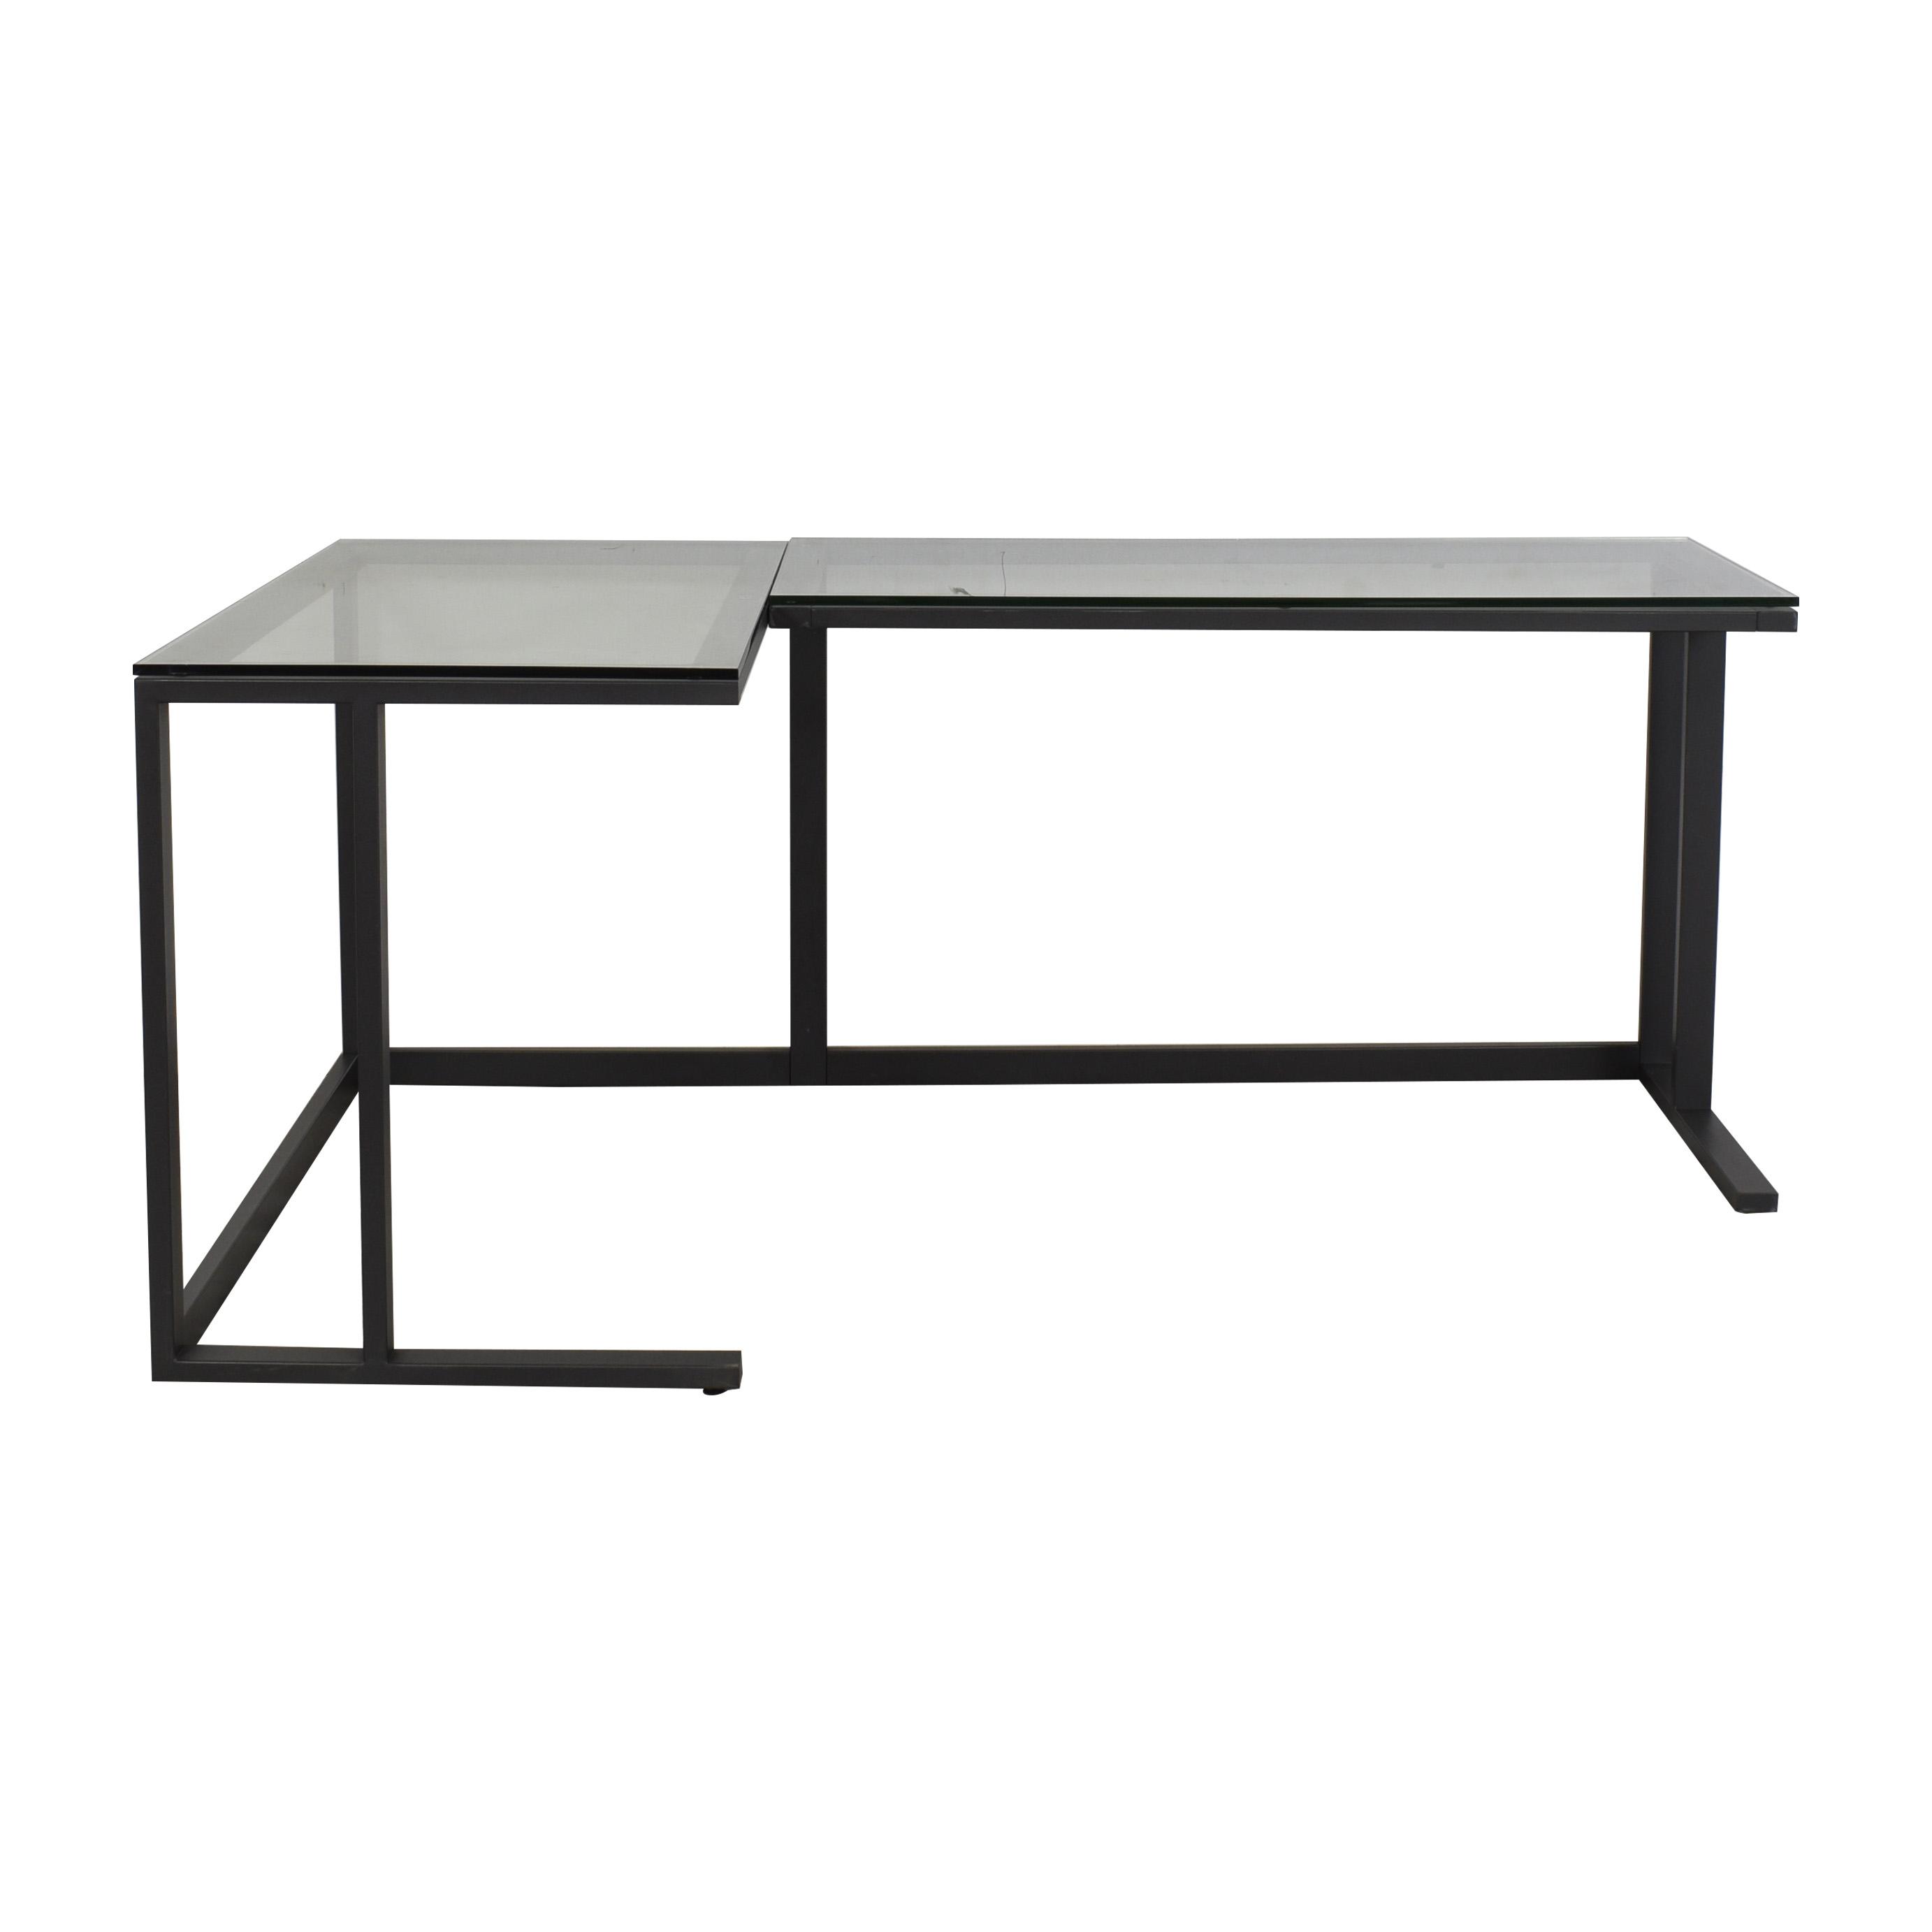 Crate & Barrel Crate & Barrel Pilsen Graphite Corner Desk Tables